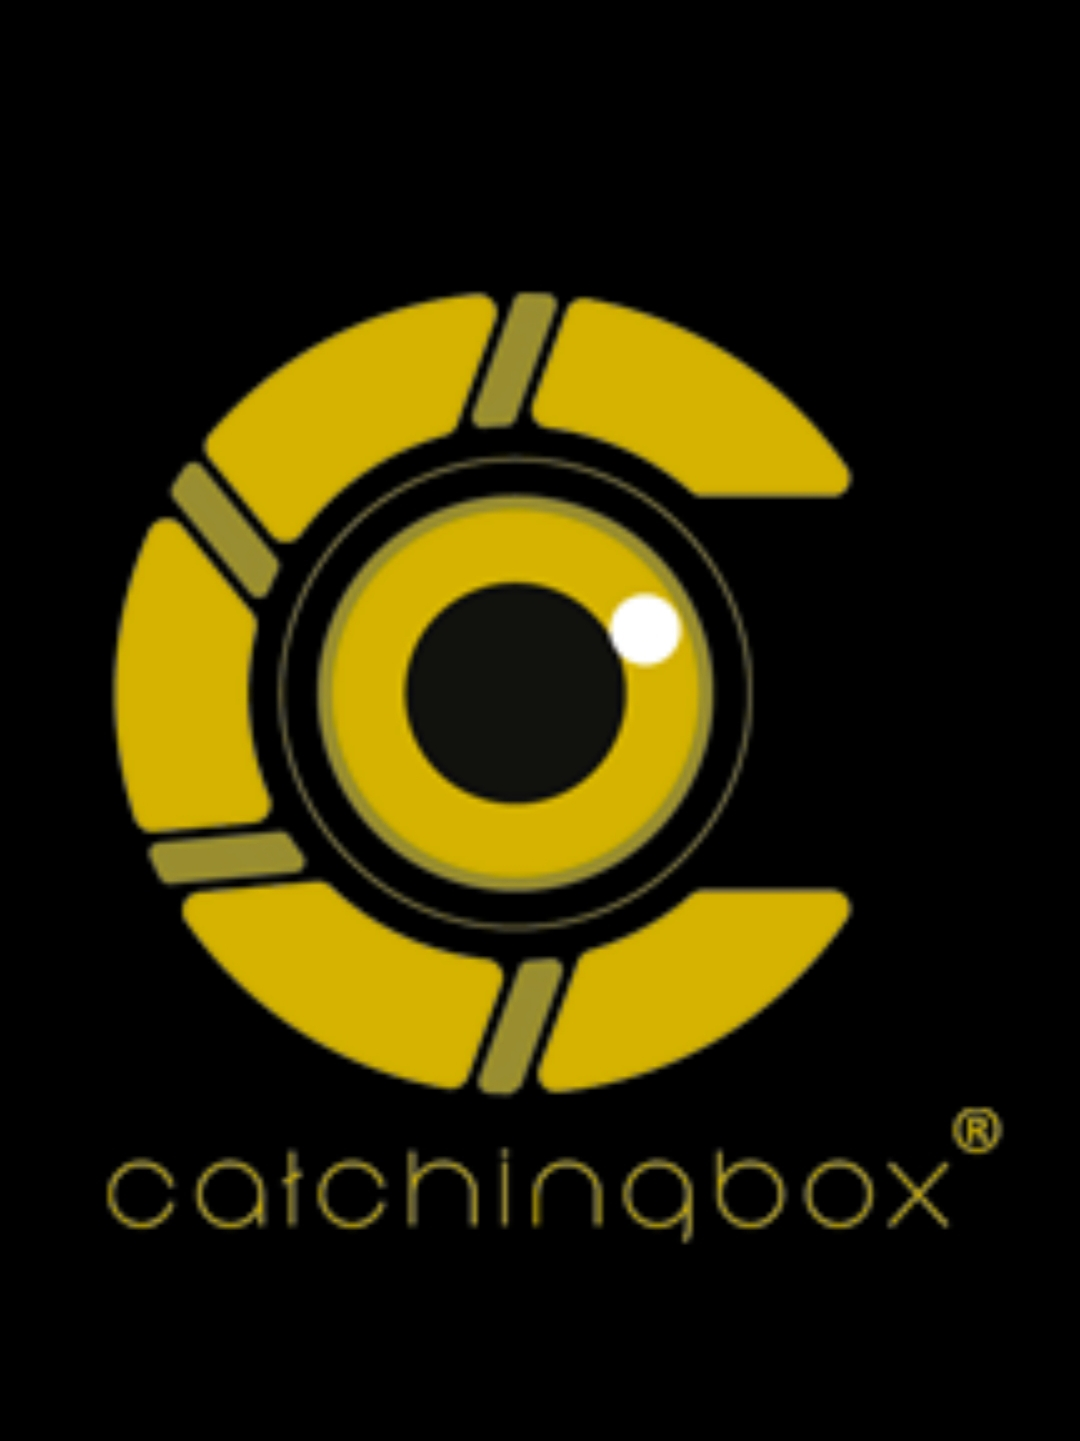 CatchingBox